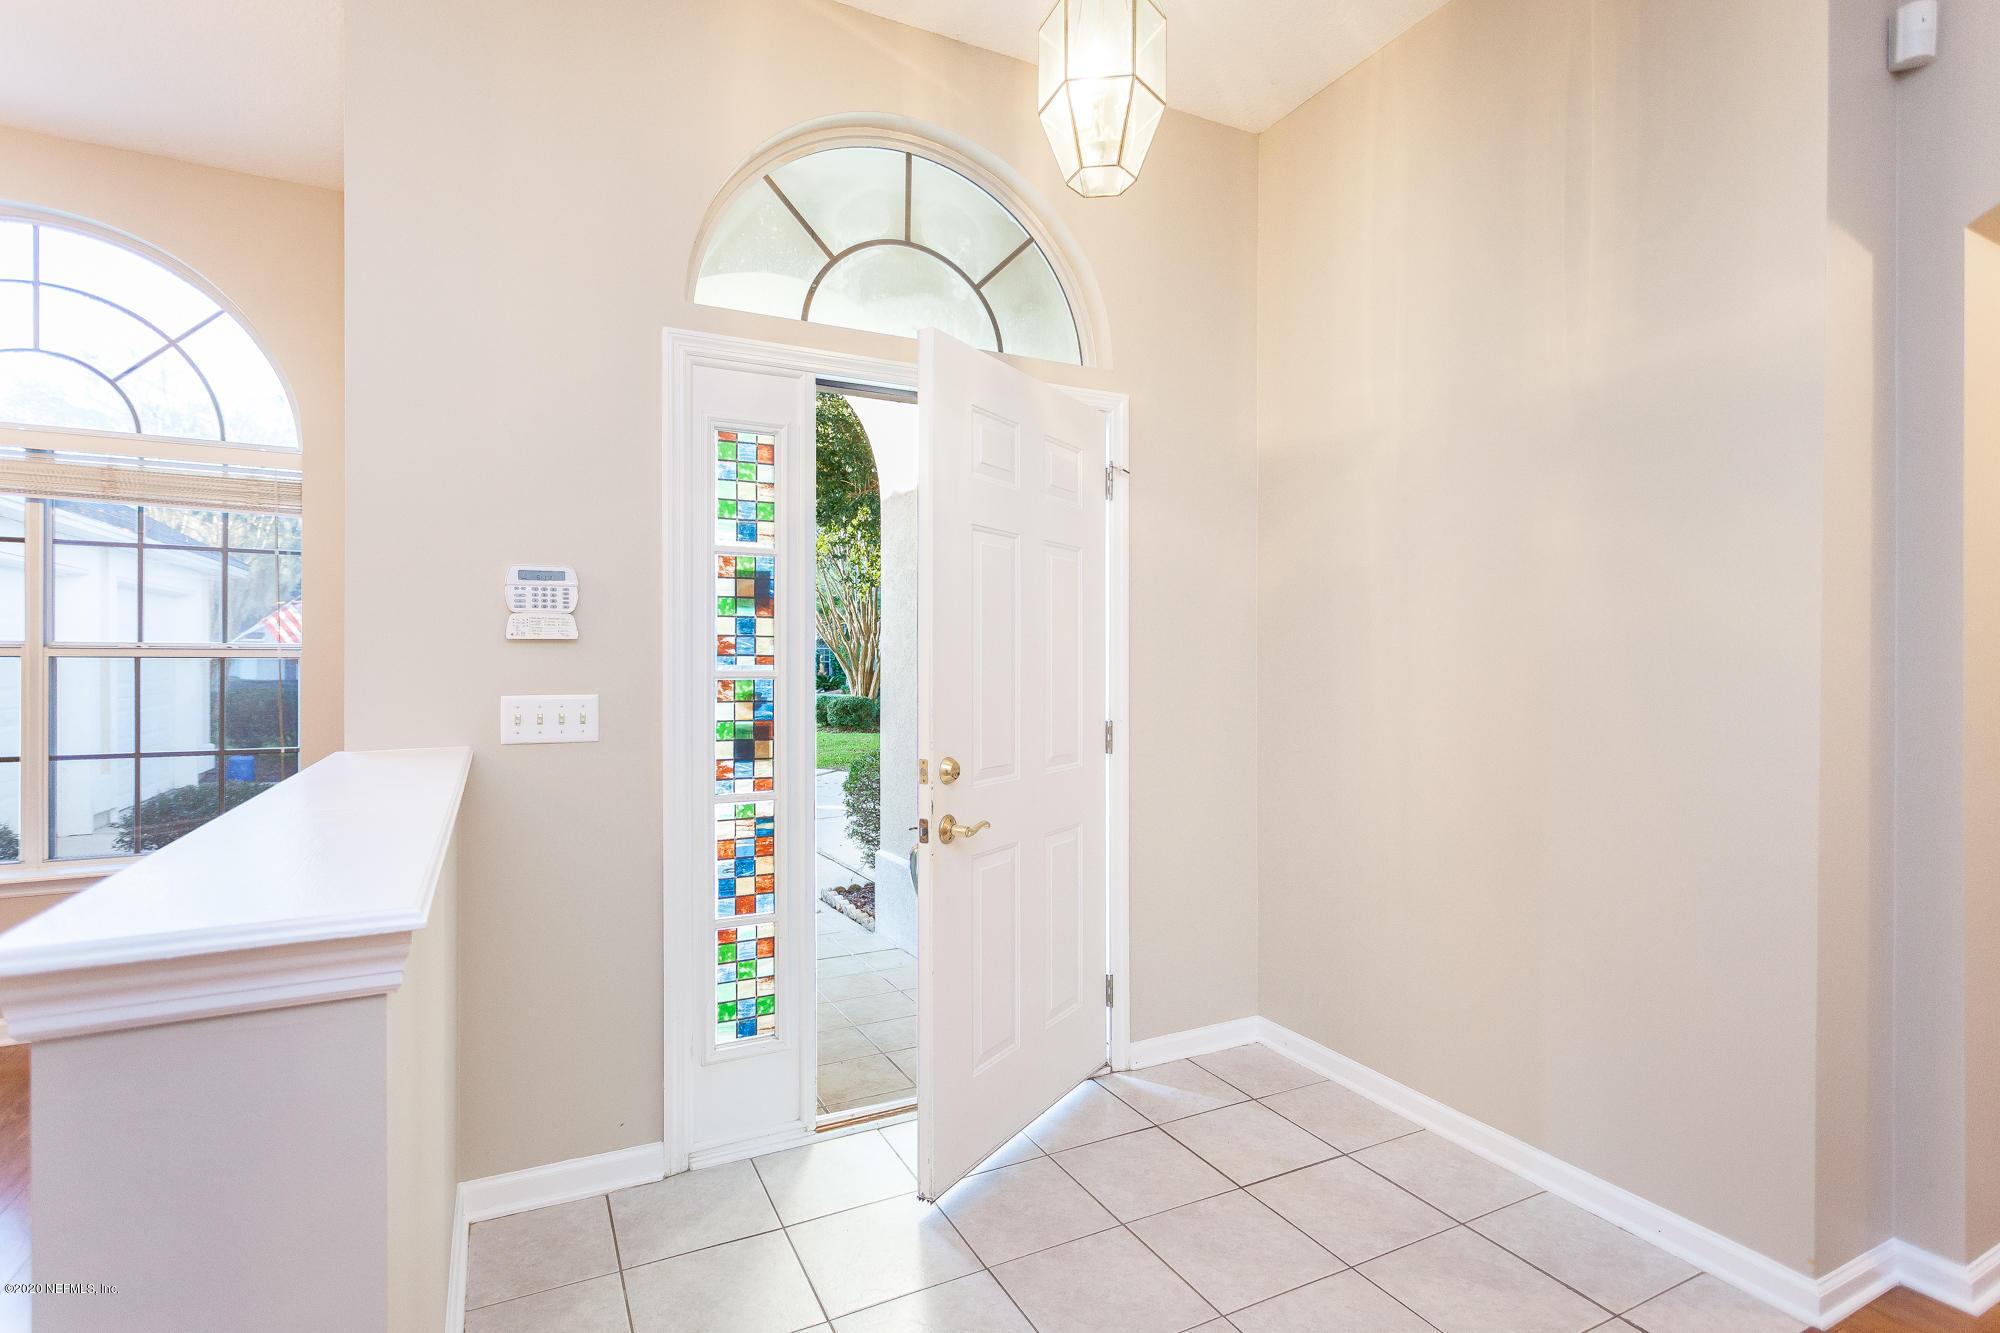 749 WESTMINSTER, ORANGE PARK, FLORIDA 32073, 3 Bedrooms Bedrooms, ,2 BathroomsBathrooms,Residential,For sale,WESTMINSTER,1083611